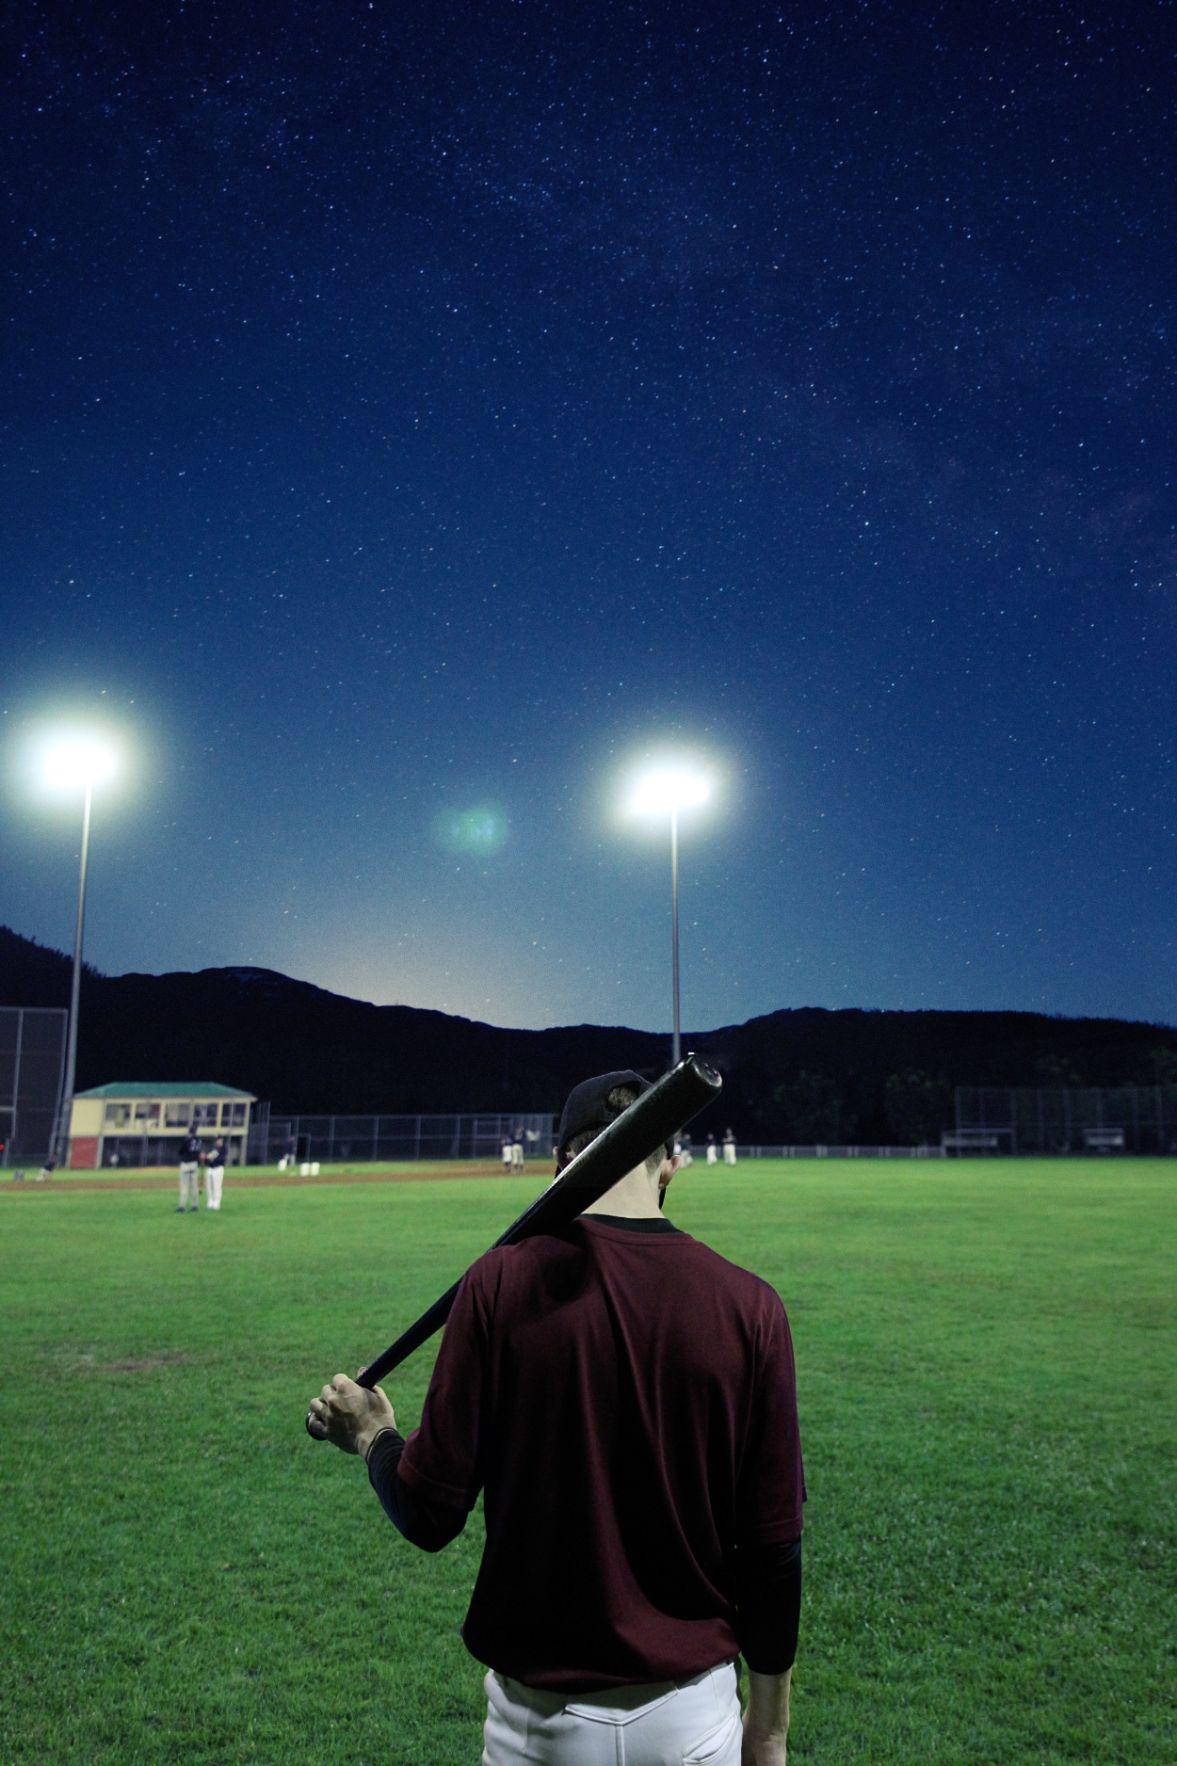 guy on a baseball field at night